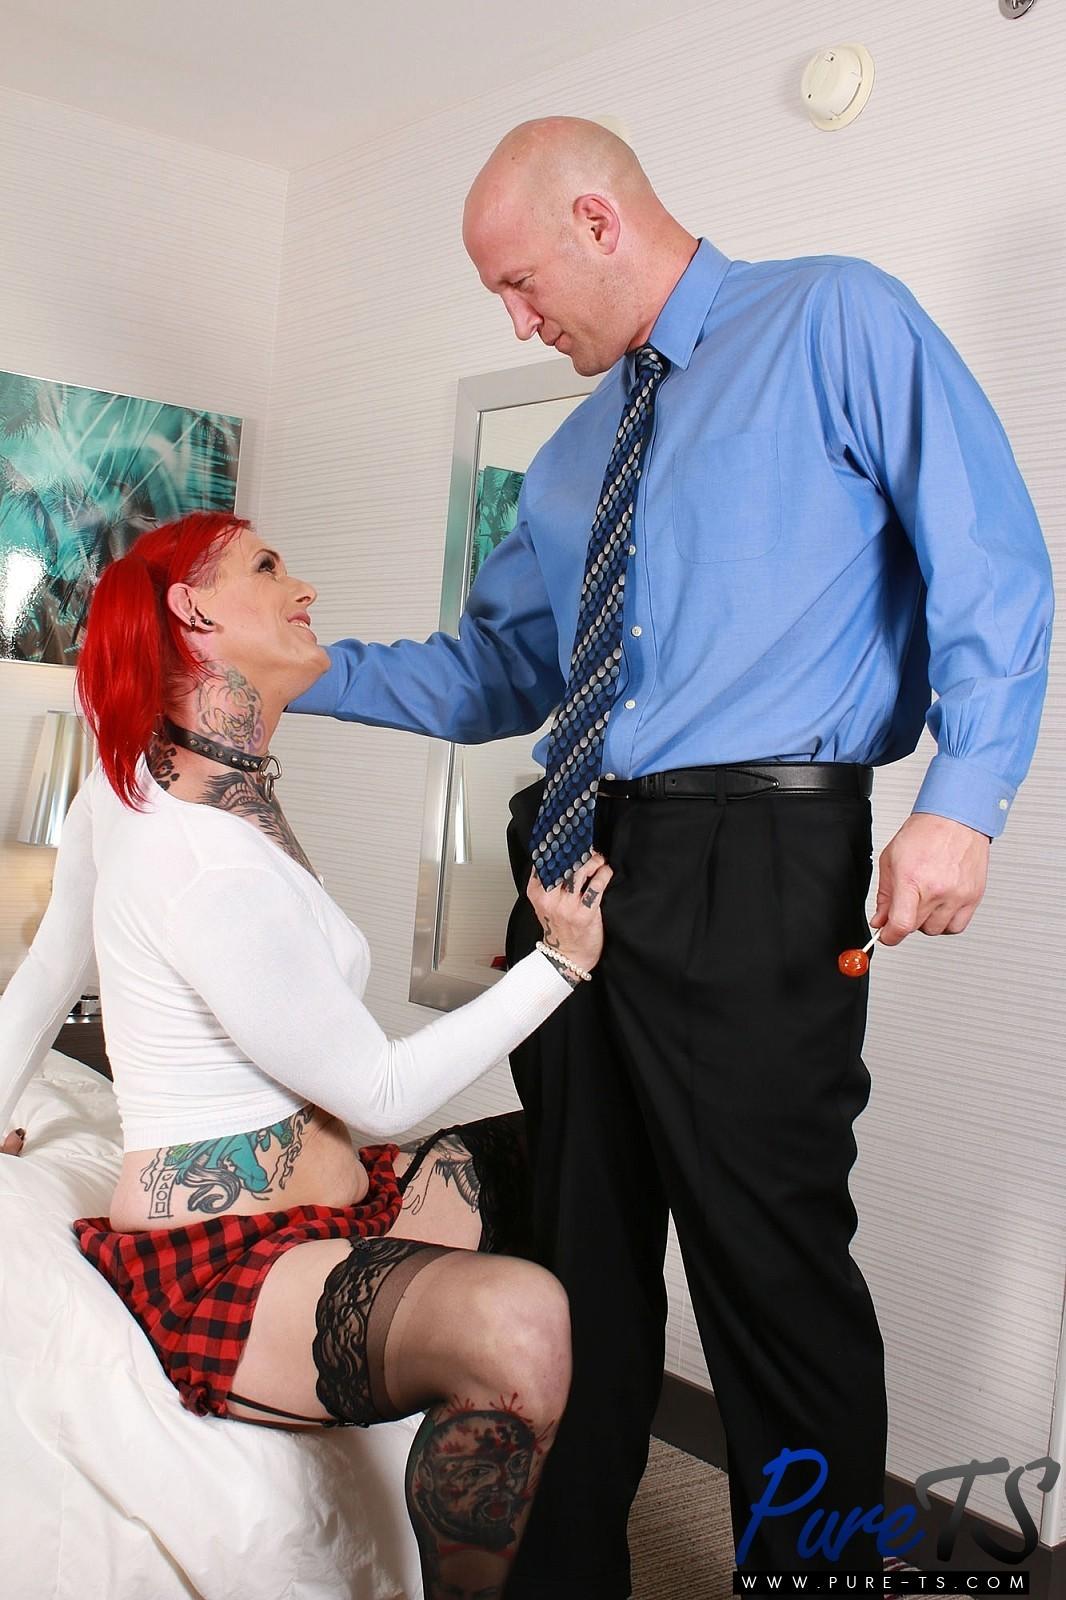 Sadie Satanas Is A Tattooed Redhead TS That Enjoys To Be Subm